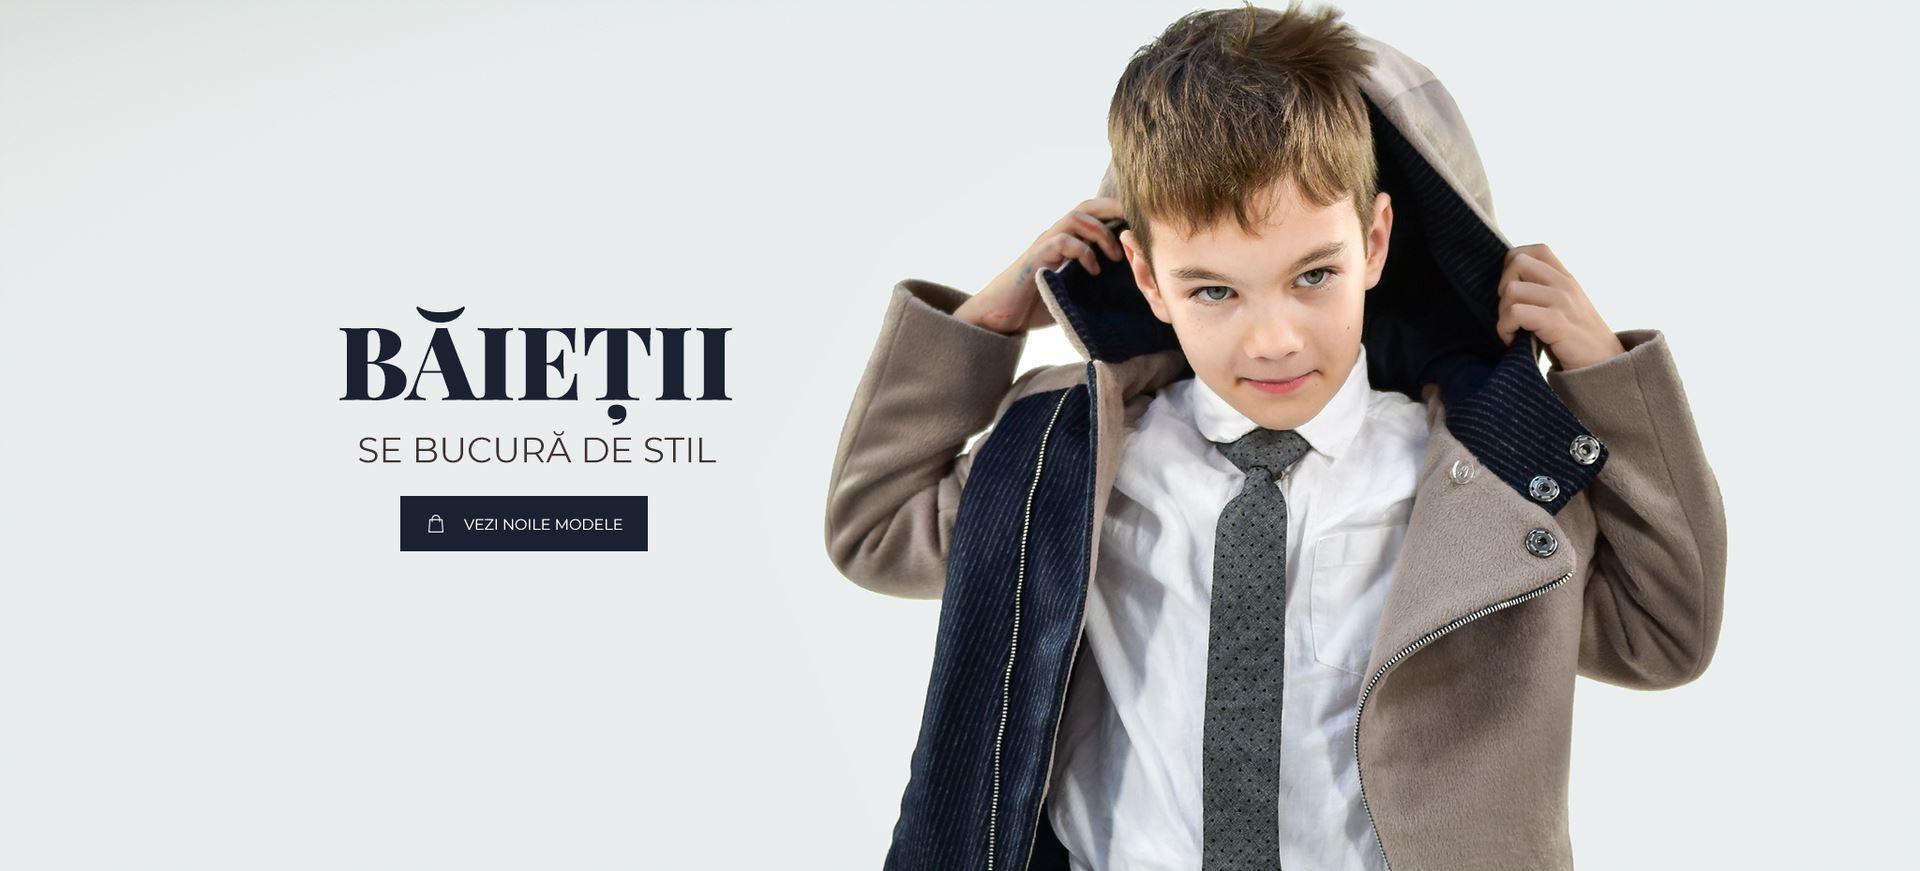 Iridorro Magazin De Hainute Pentru Copii Produse Cu Drag In Romania